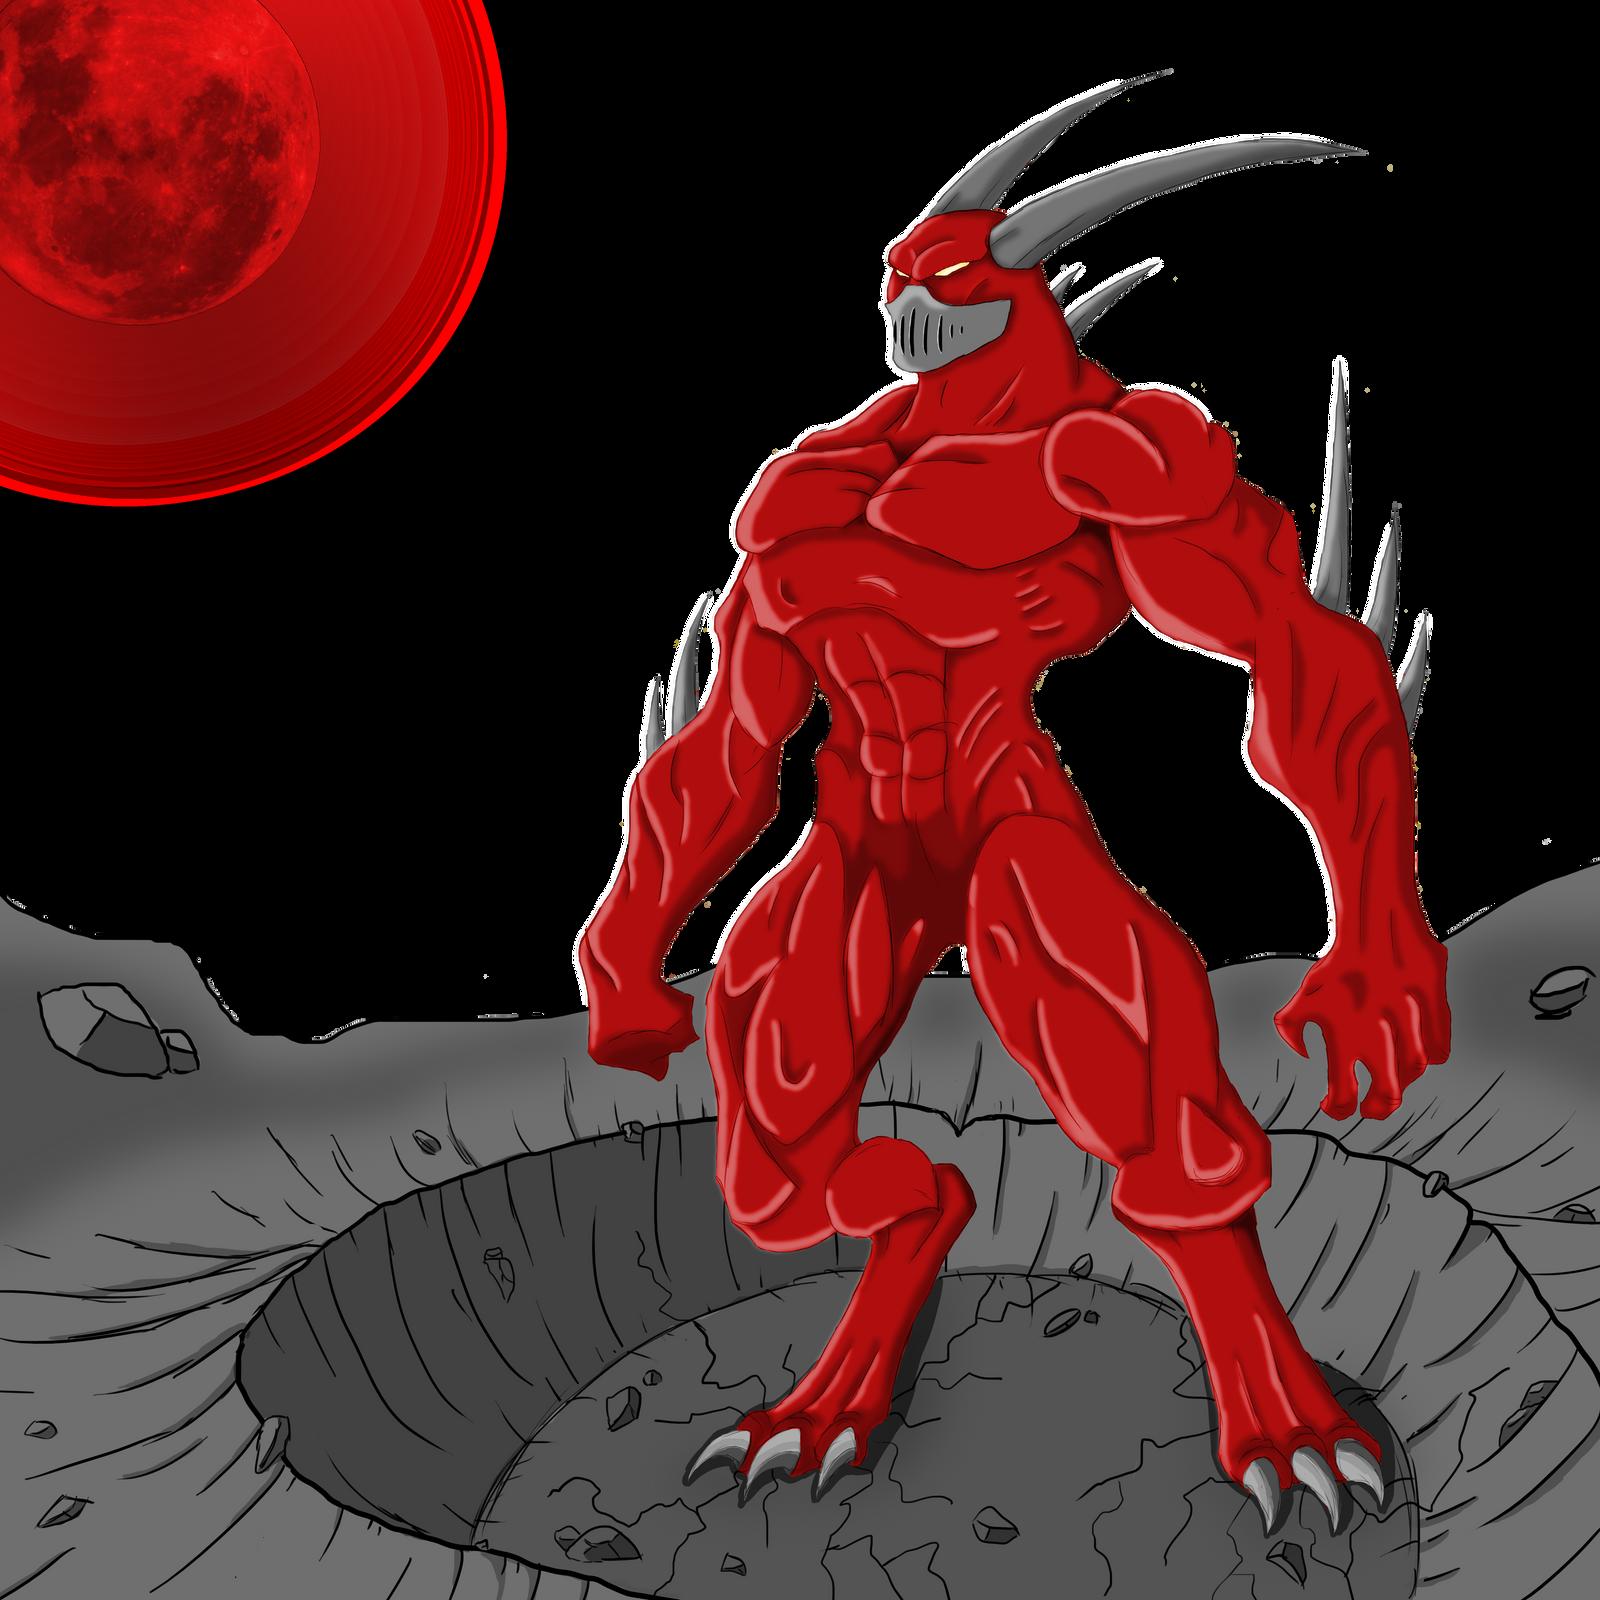 red moon demon - photo #2